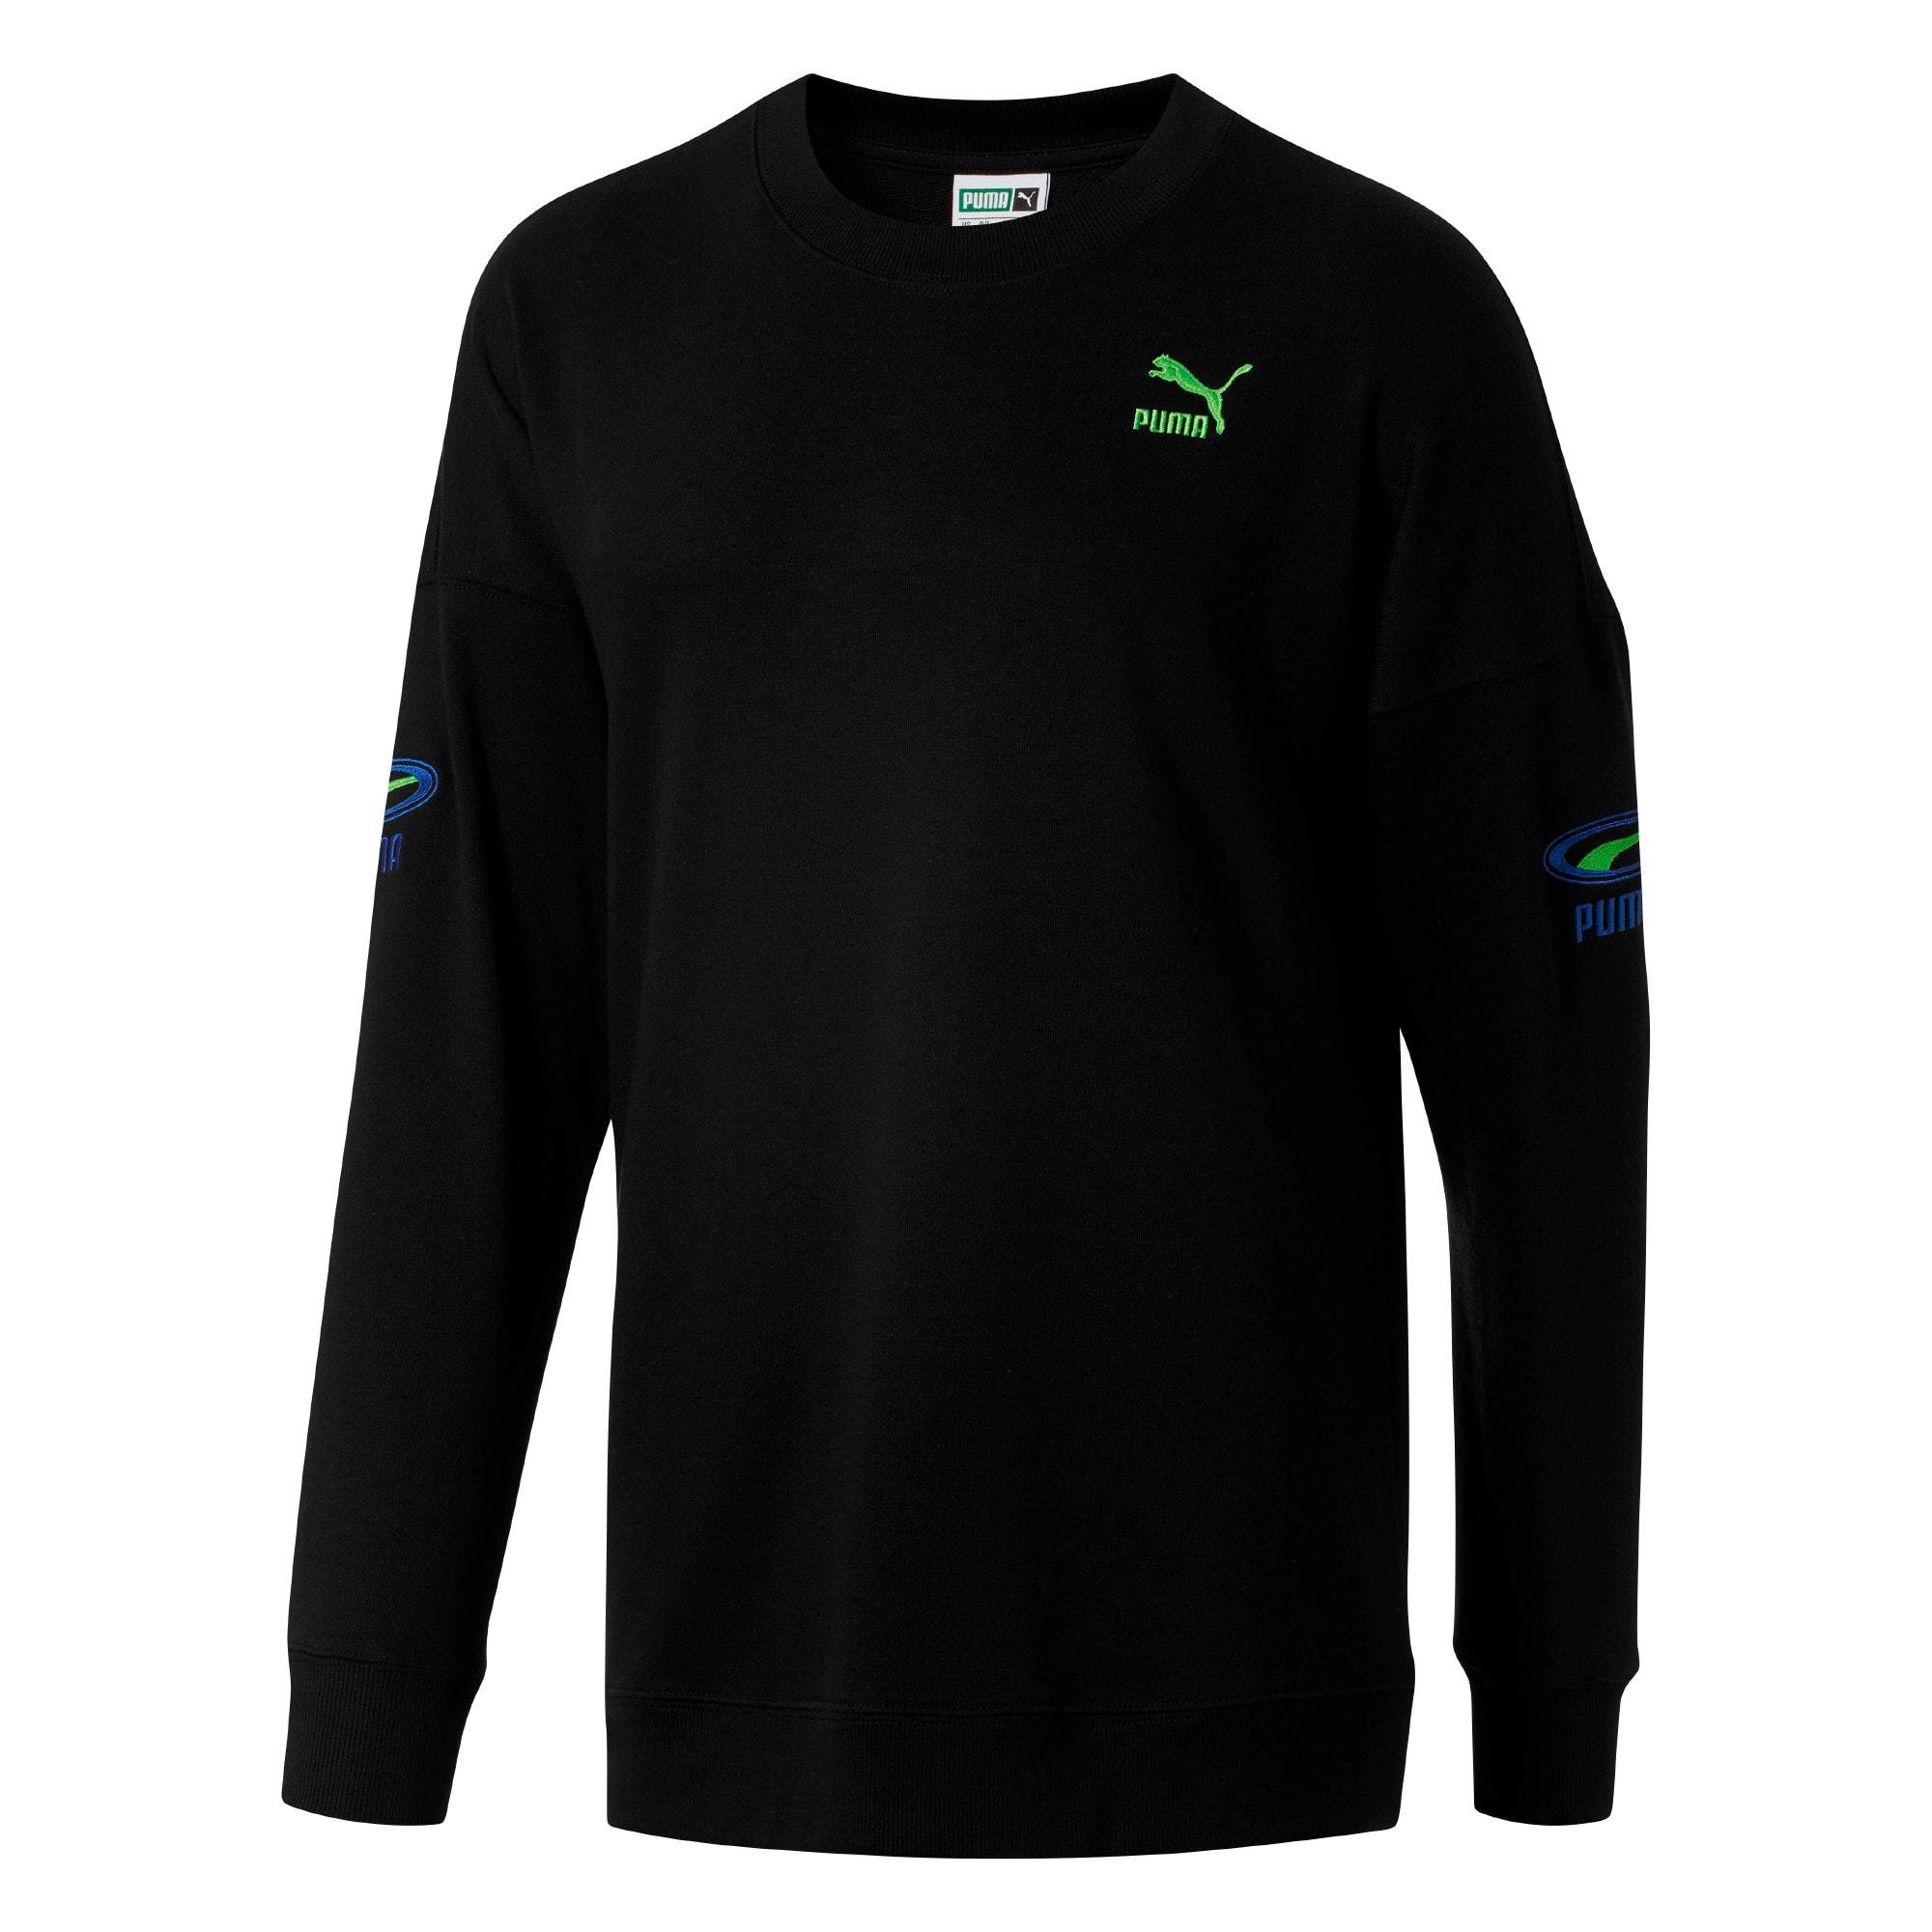 Thumbnail 2 of OG Men's Crewneck Sweatshirt, Puma Black, medium